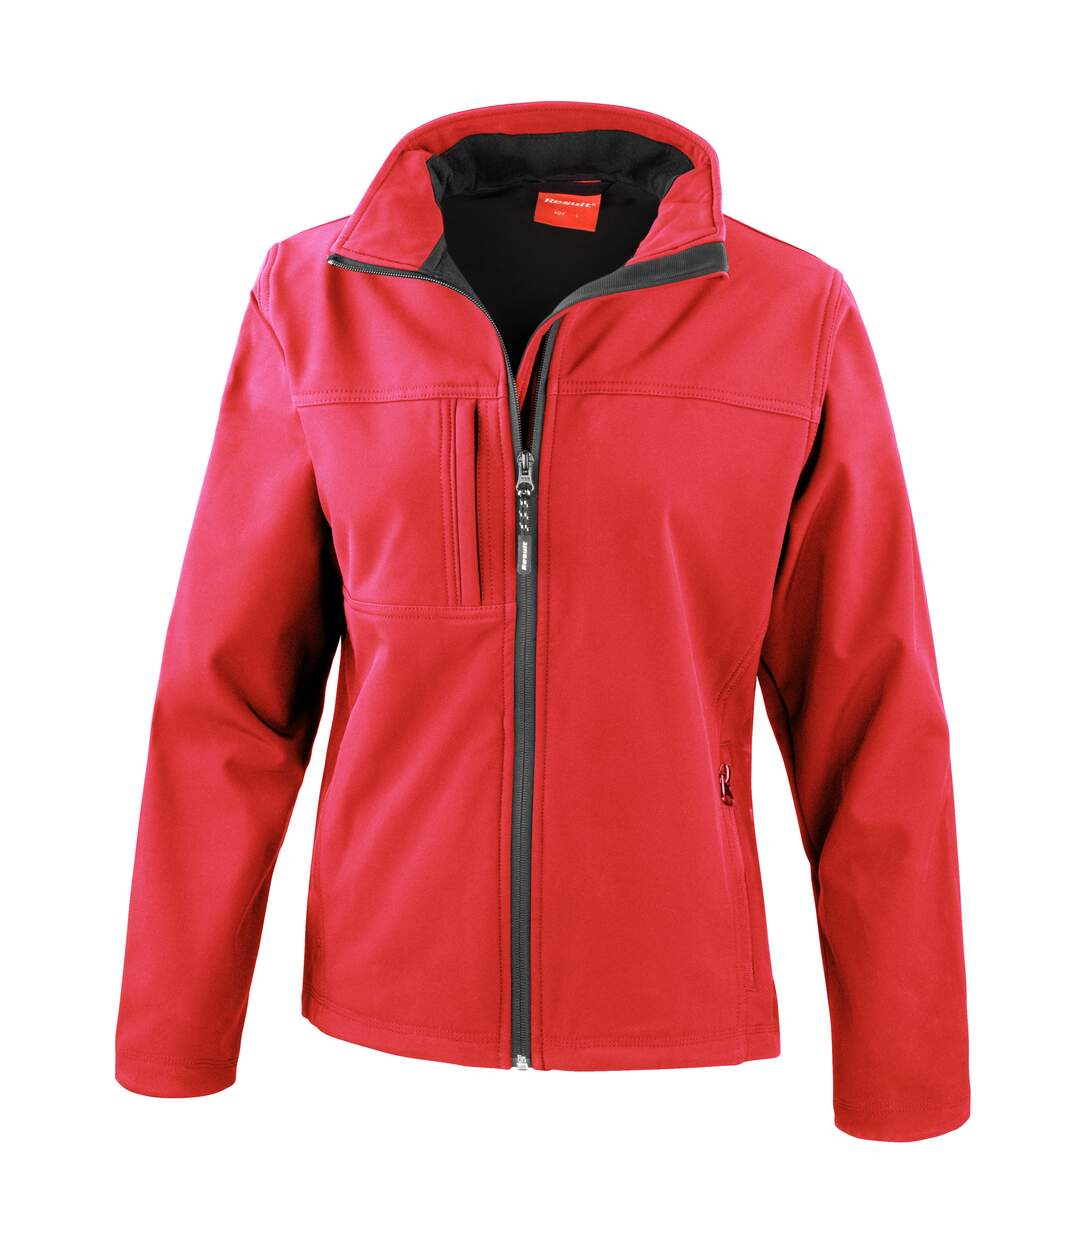 Result Womens Softshell Premium 3 Layer Performance Jacket (Waterproof, Windproof & Breathable) (Grey) - UTBC2045